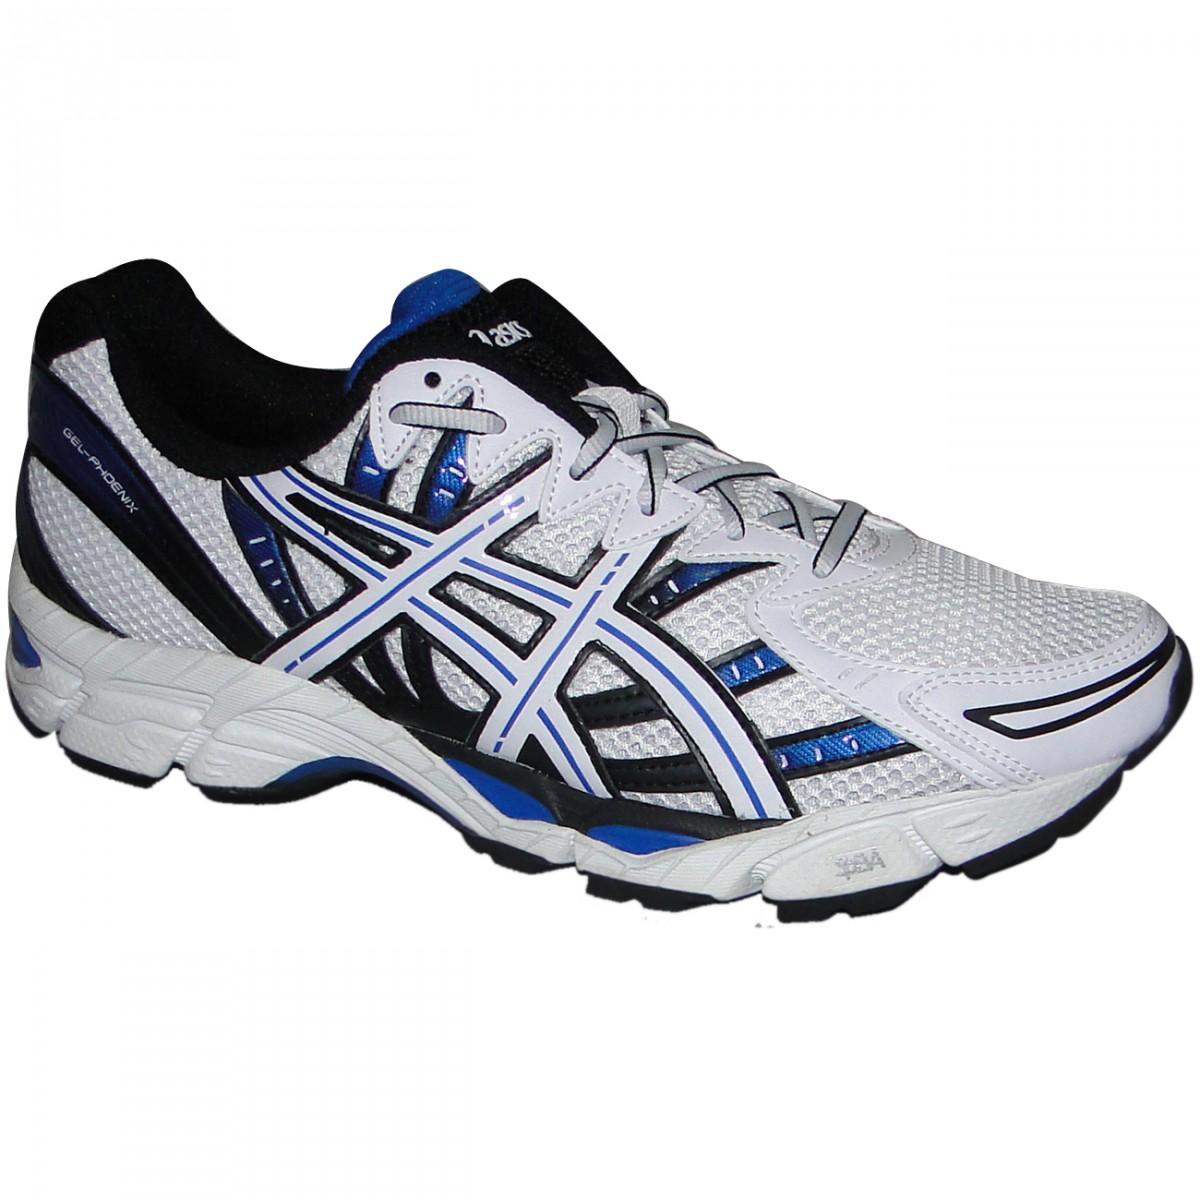 f1181bca83bf6 Tenis Asics Gel-Phoenix 4 T223N N-0190 - Branco Preto Azul - Chuteira Nike